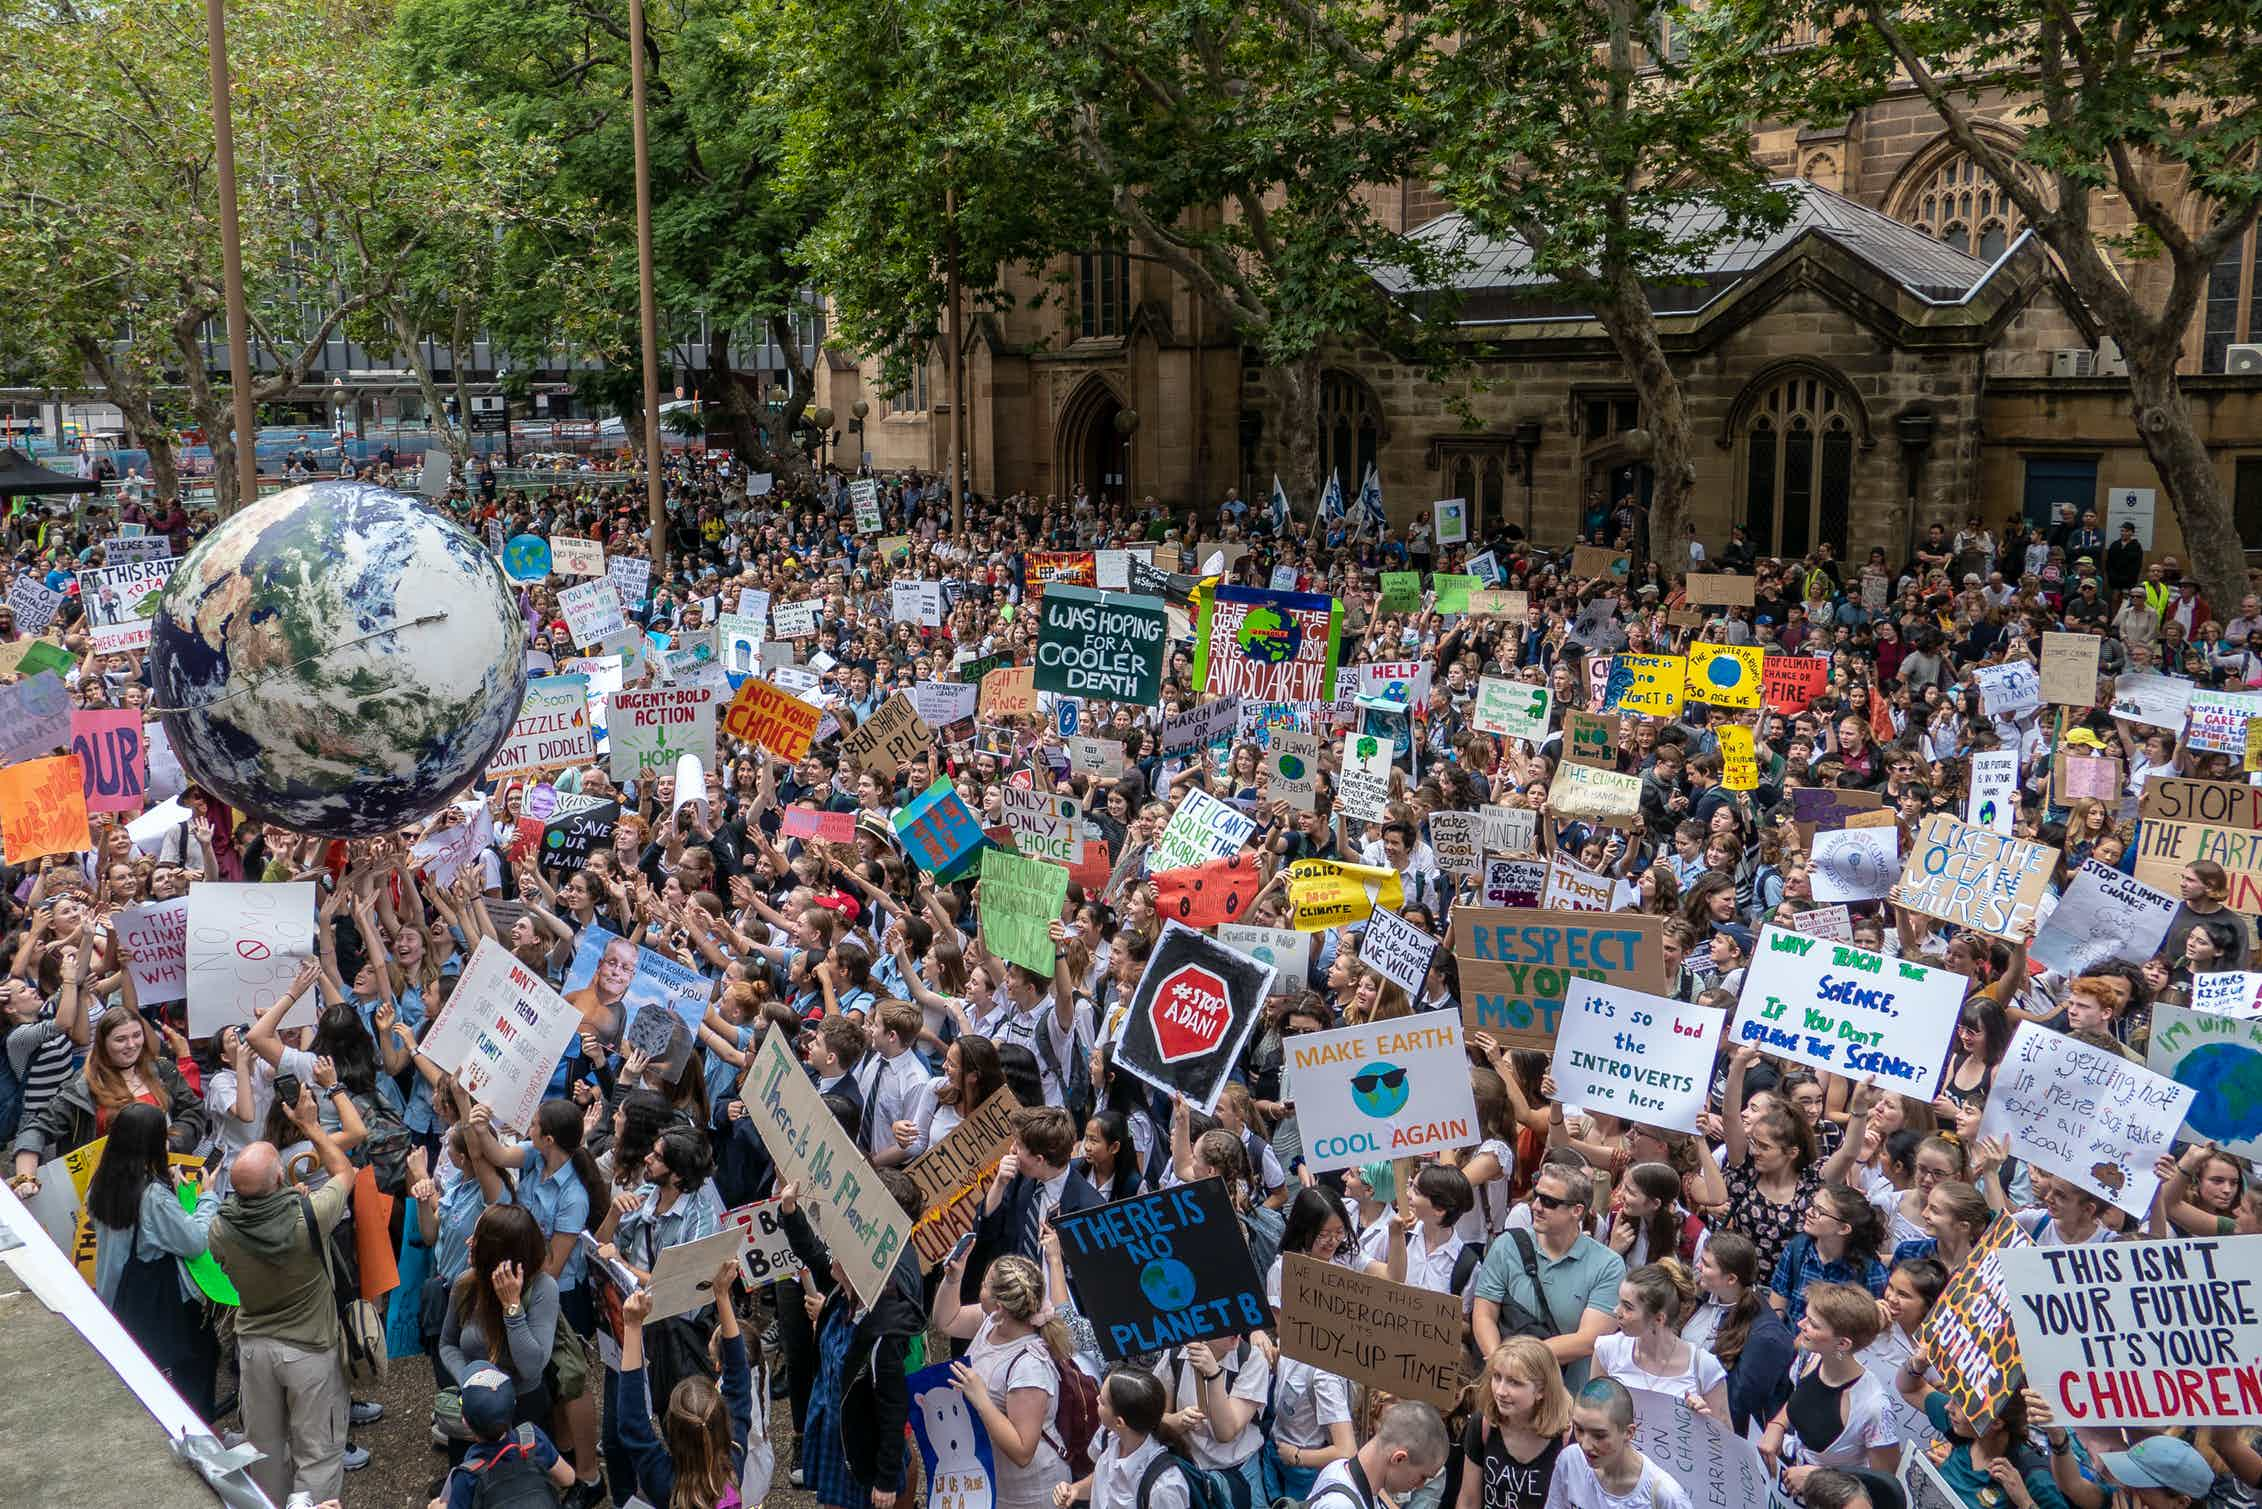 halt climate change debate - HD2262×1509